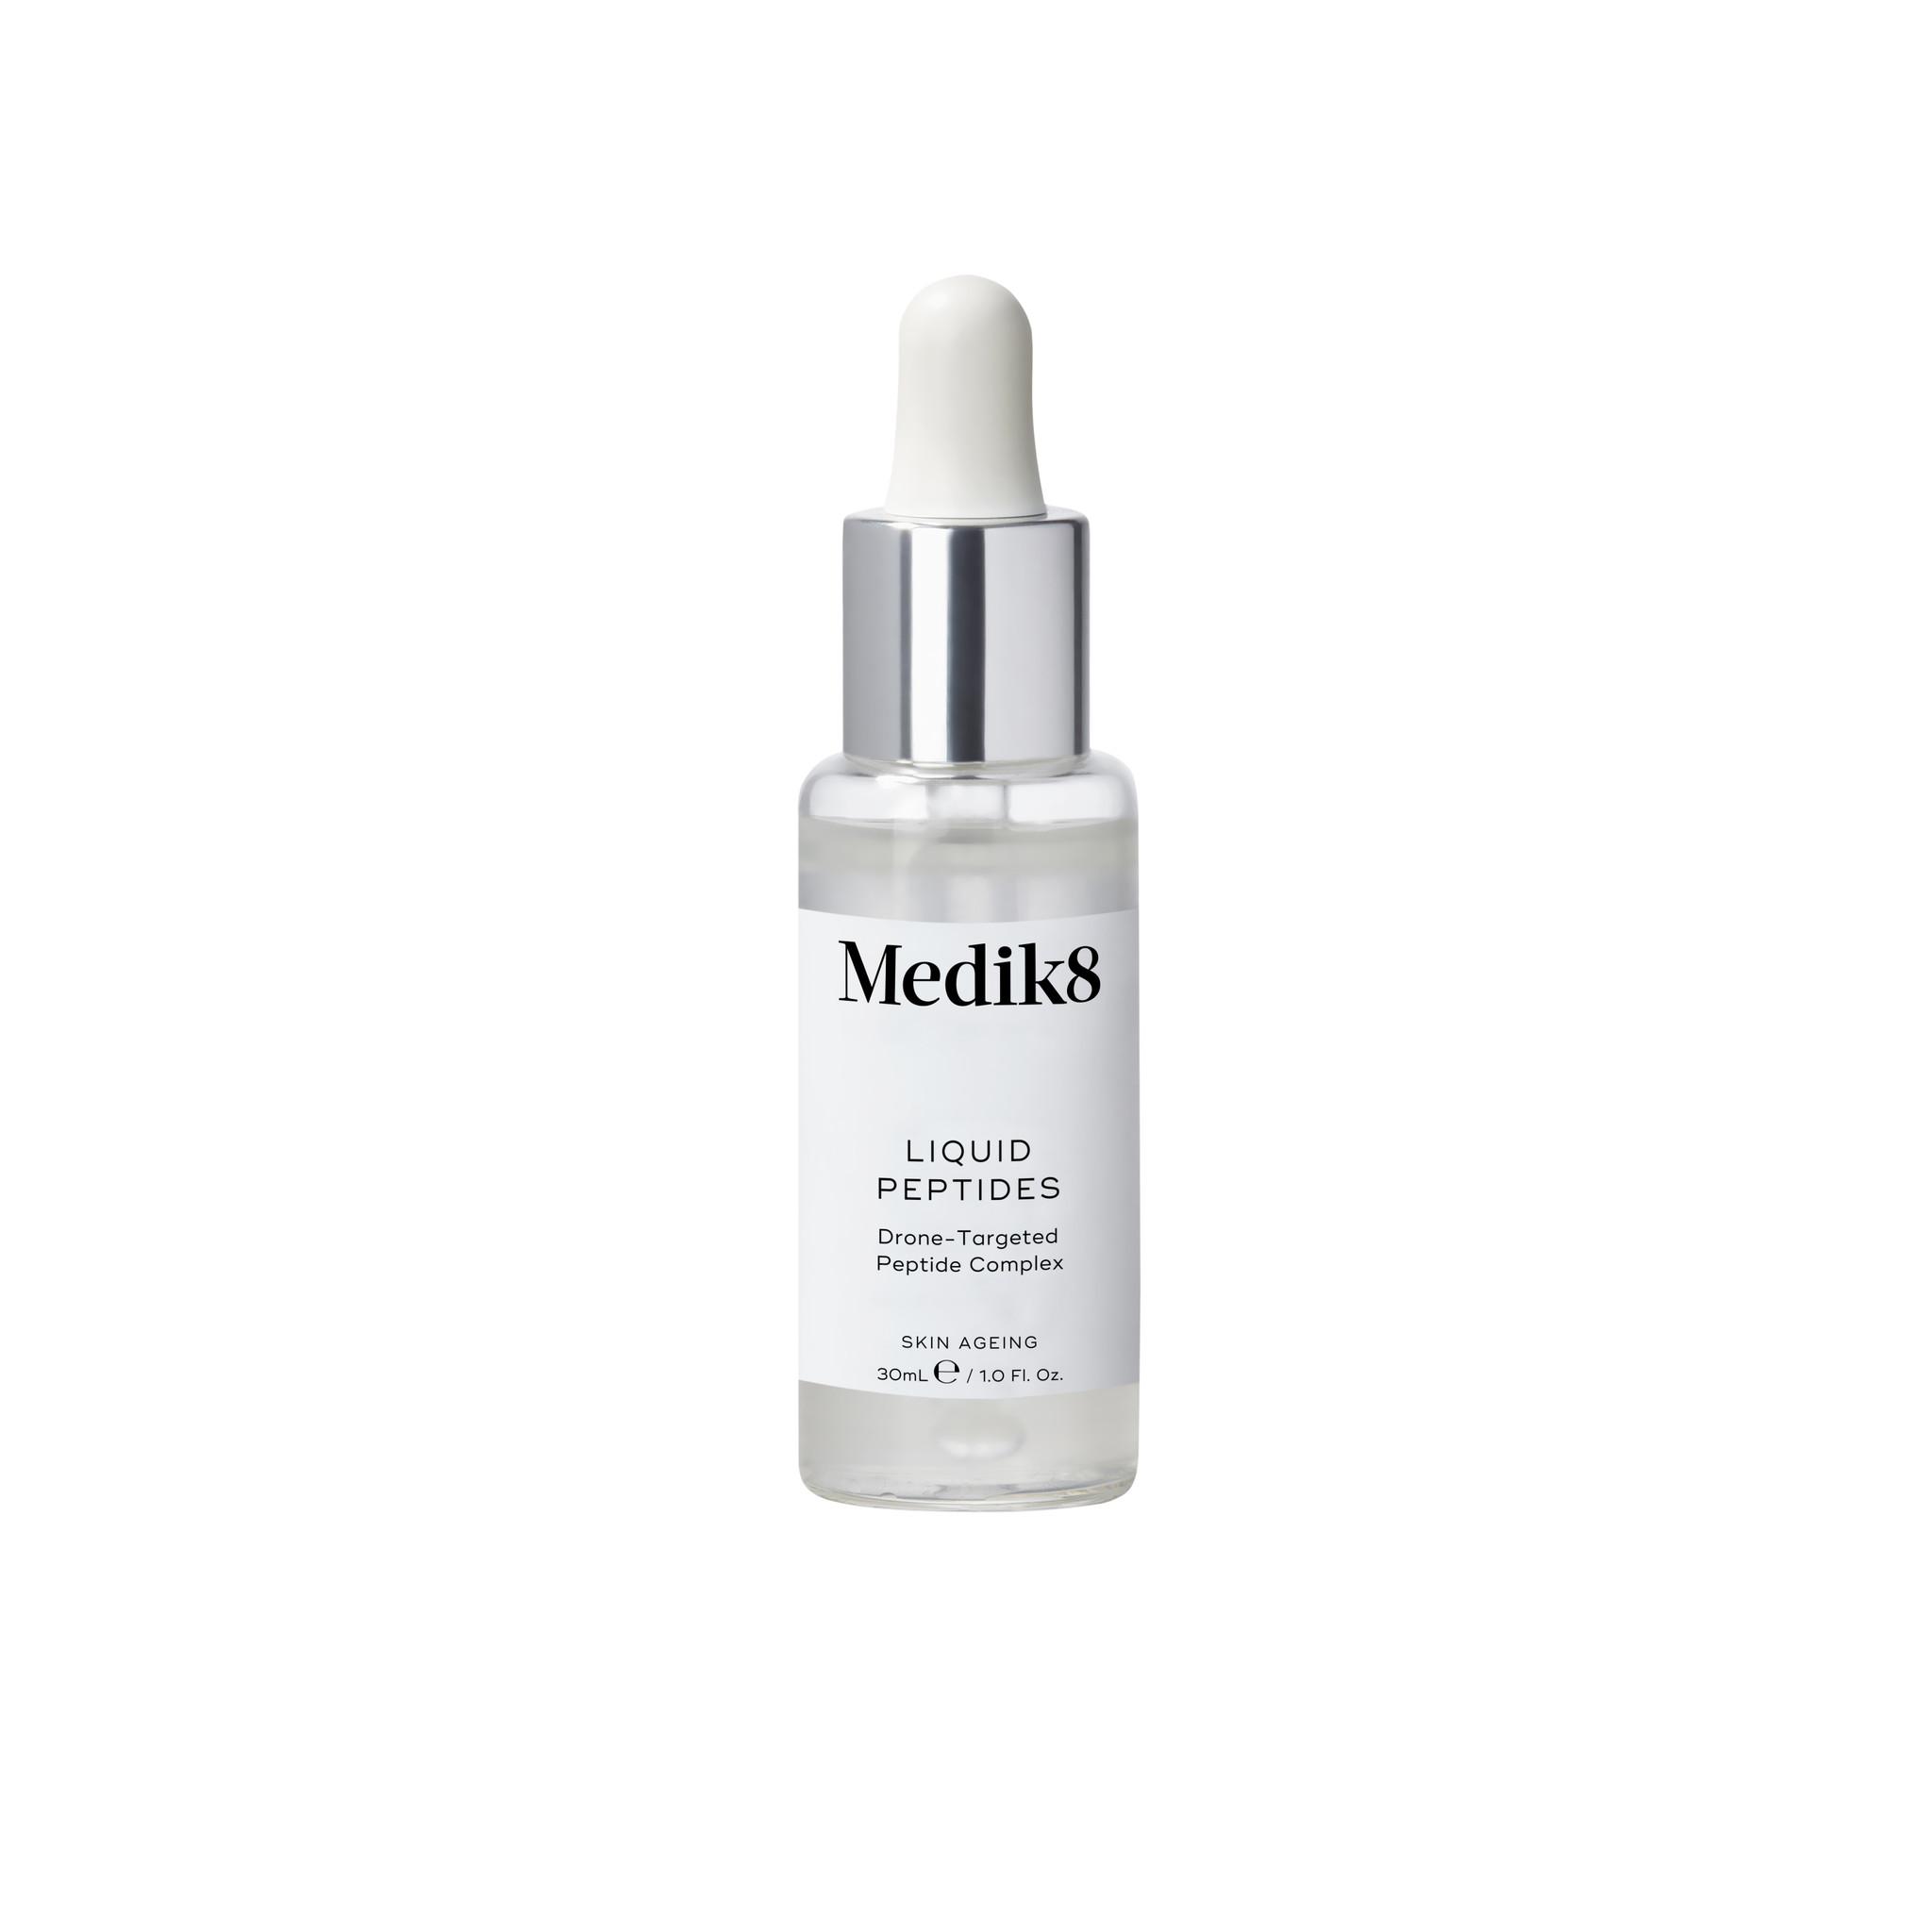 Medik8 Medik8 Try me Size: Liquid Peptides (8ml)